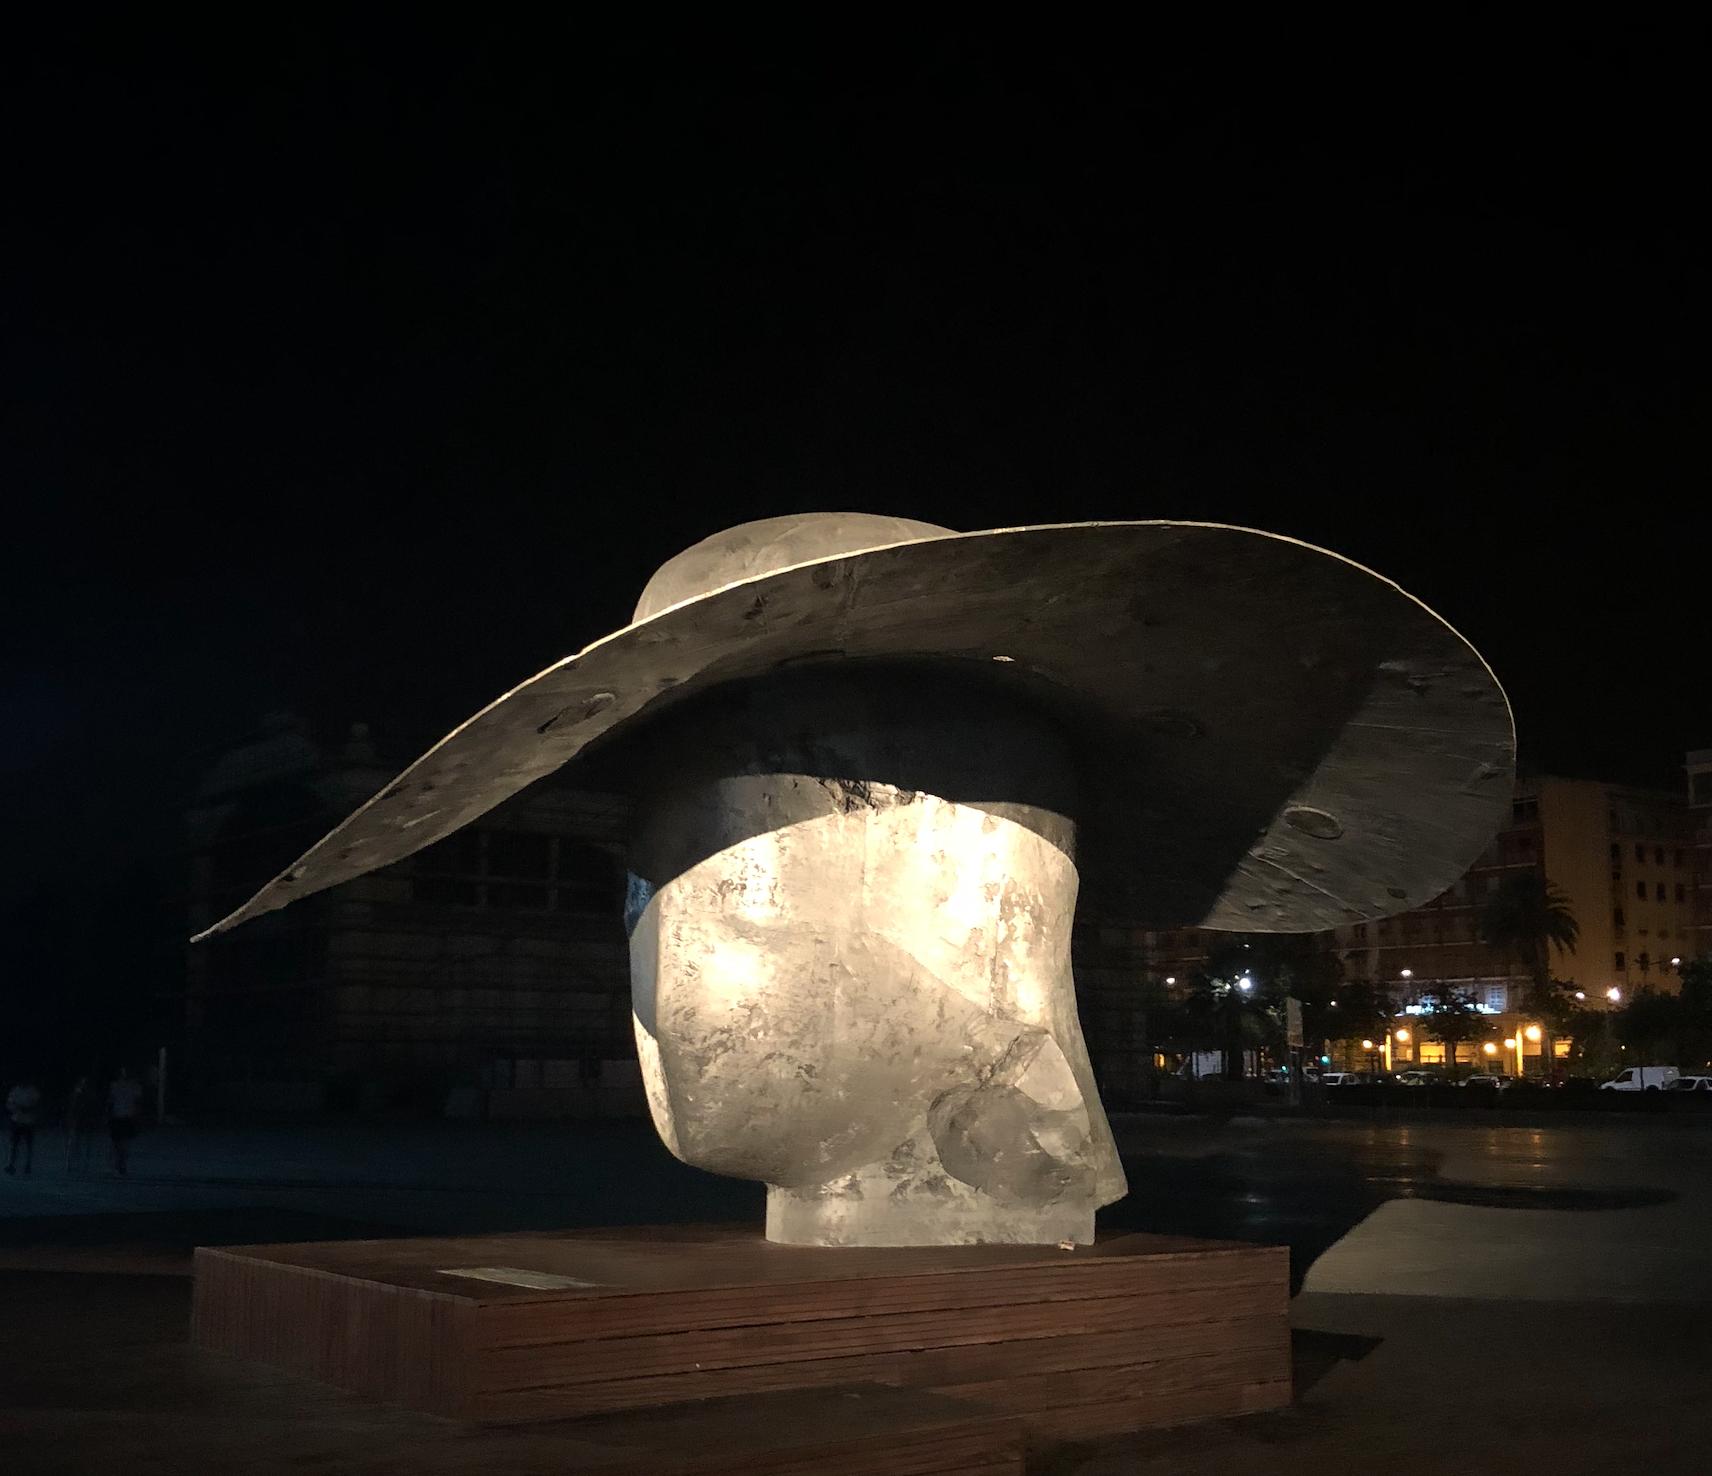 Escultura de Manolo Valdés en La Marina de Valencia. Foto: Pepo Torres